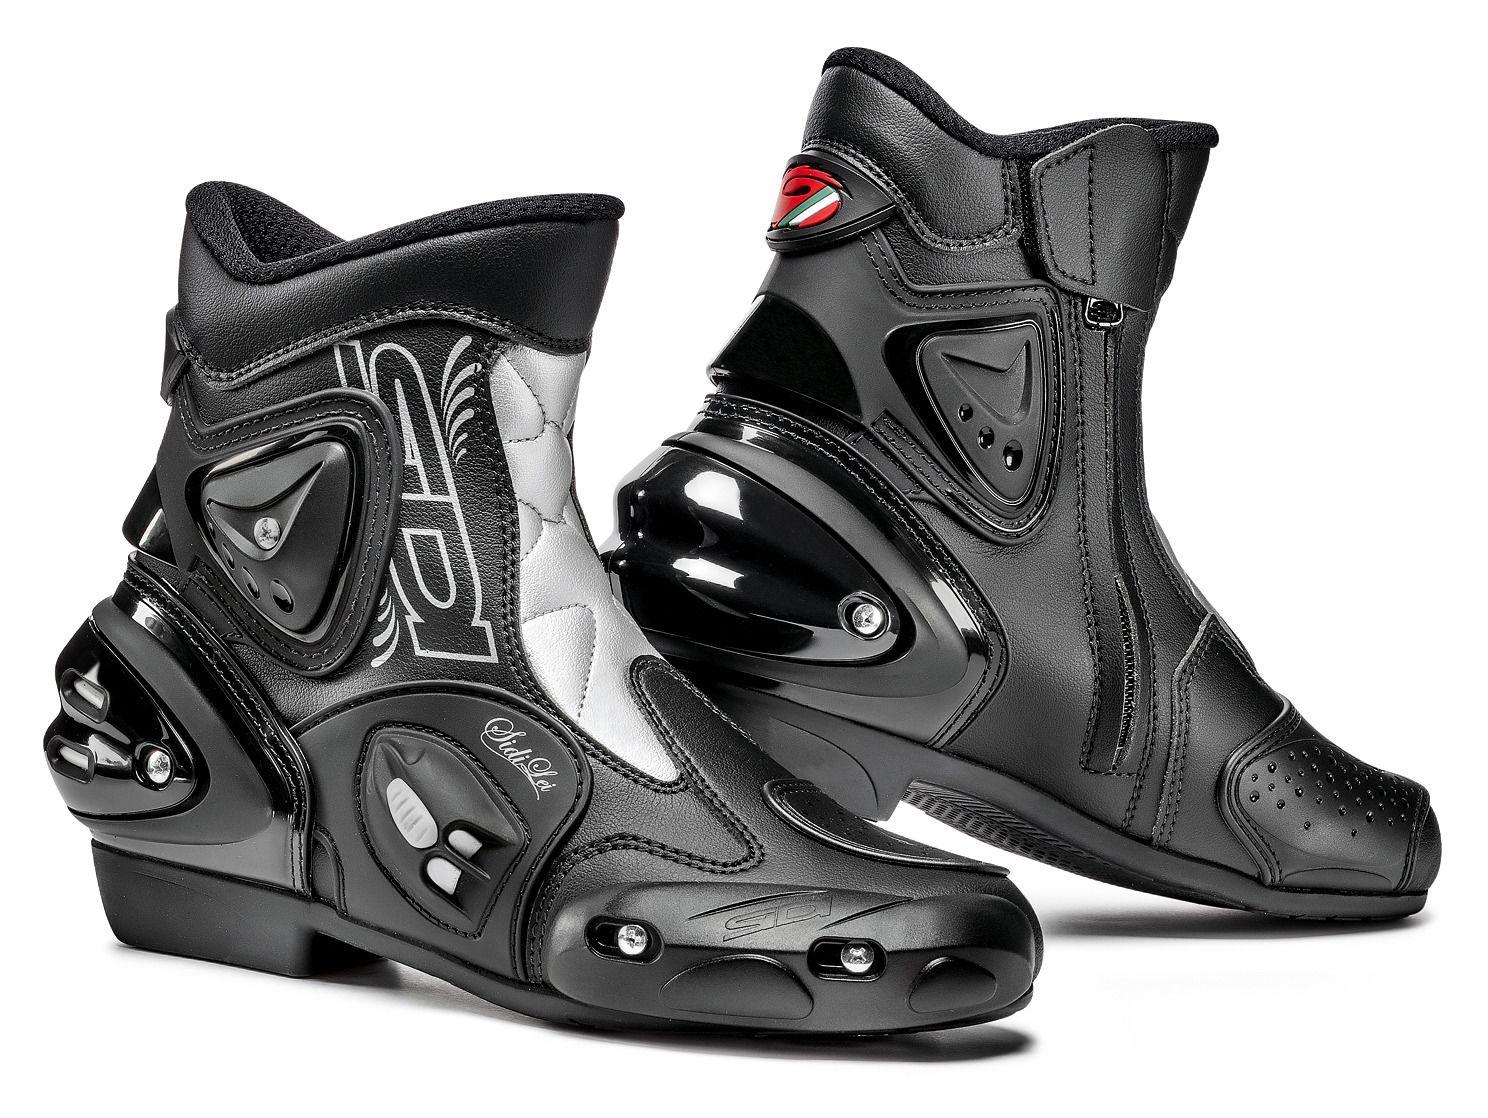 Sidi Apex Motorcycle Boots